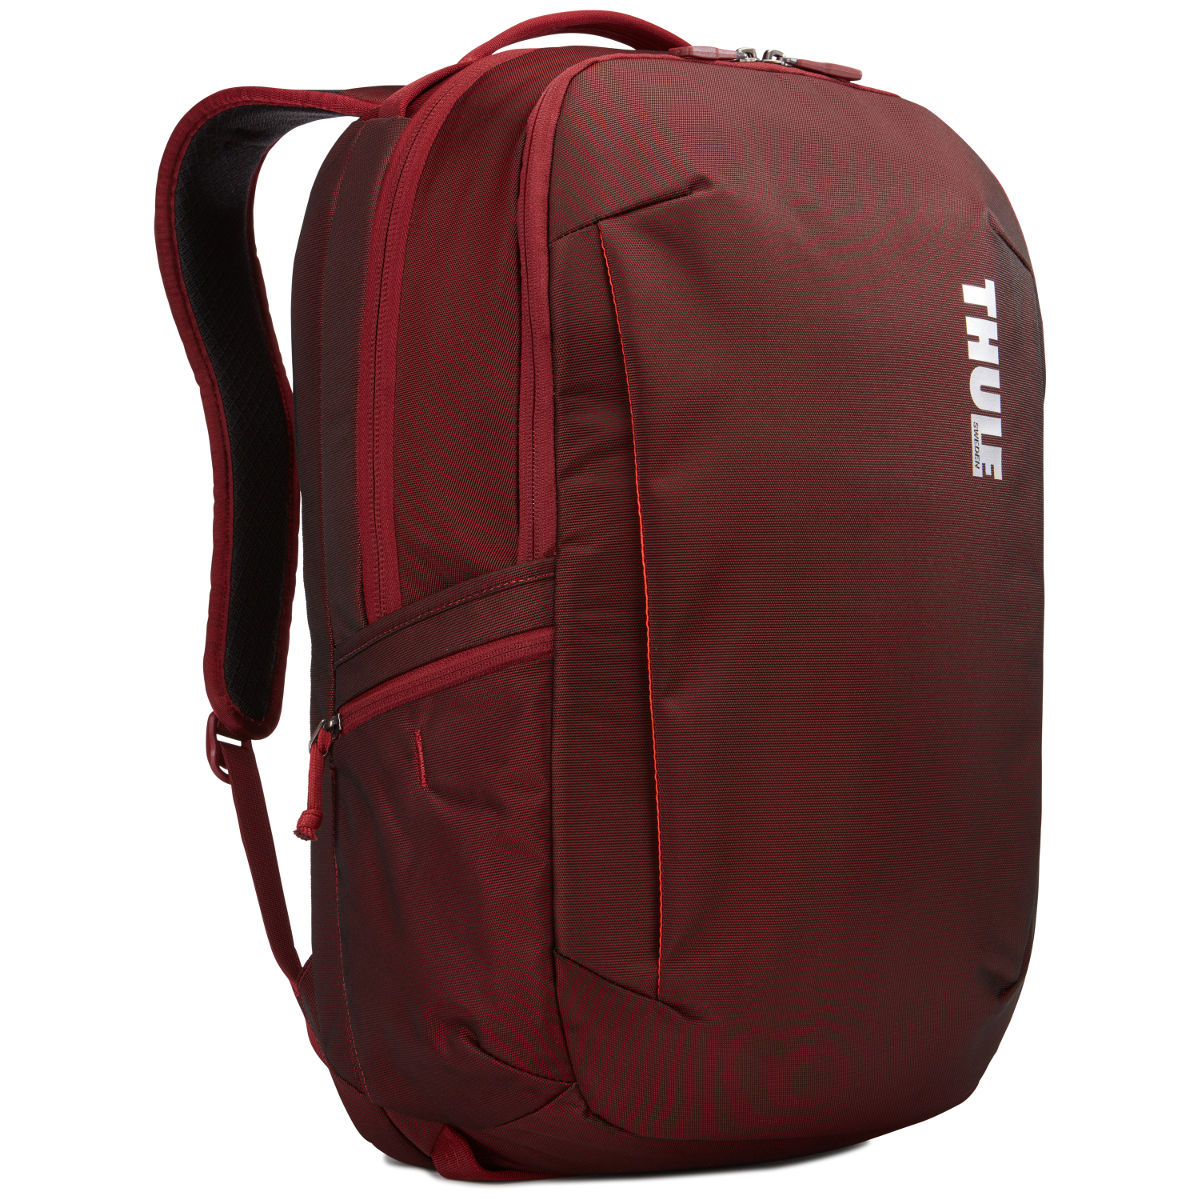 Thule Subterra Backpack, 30L, Ember